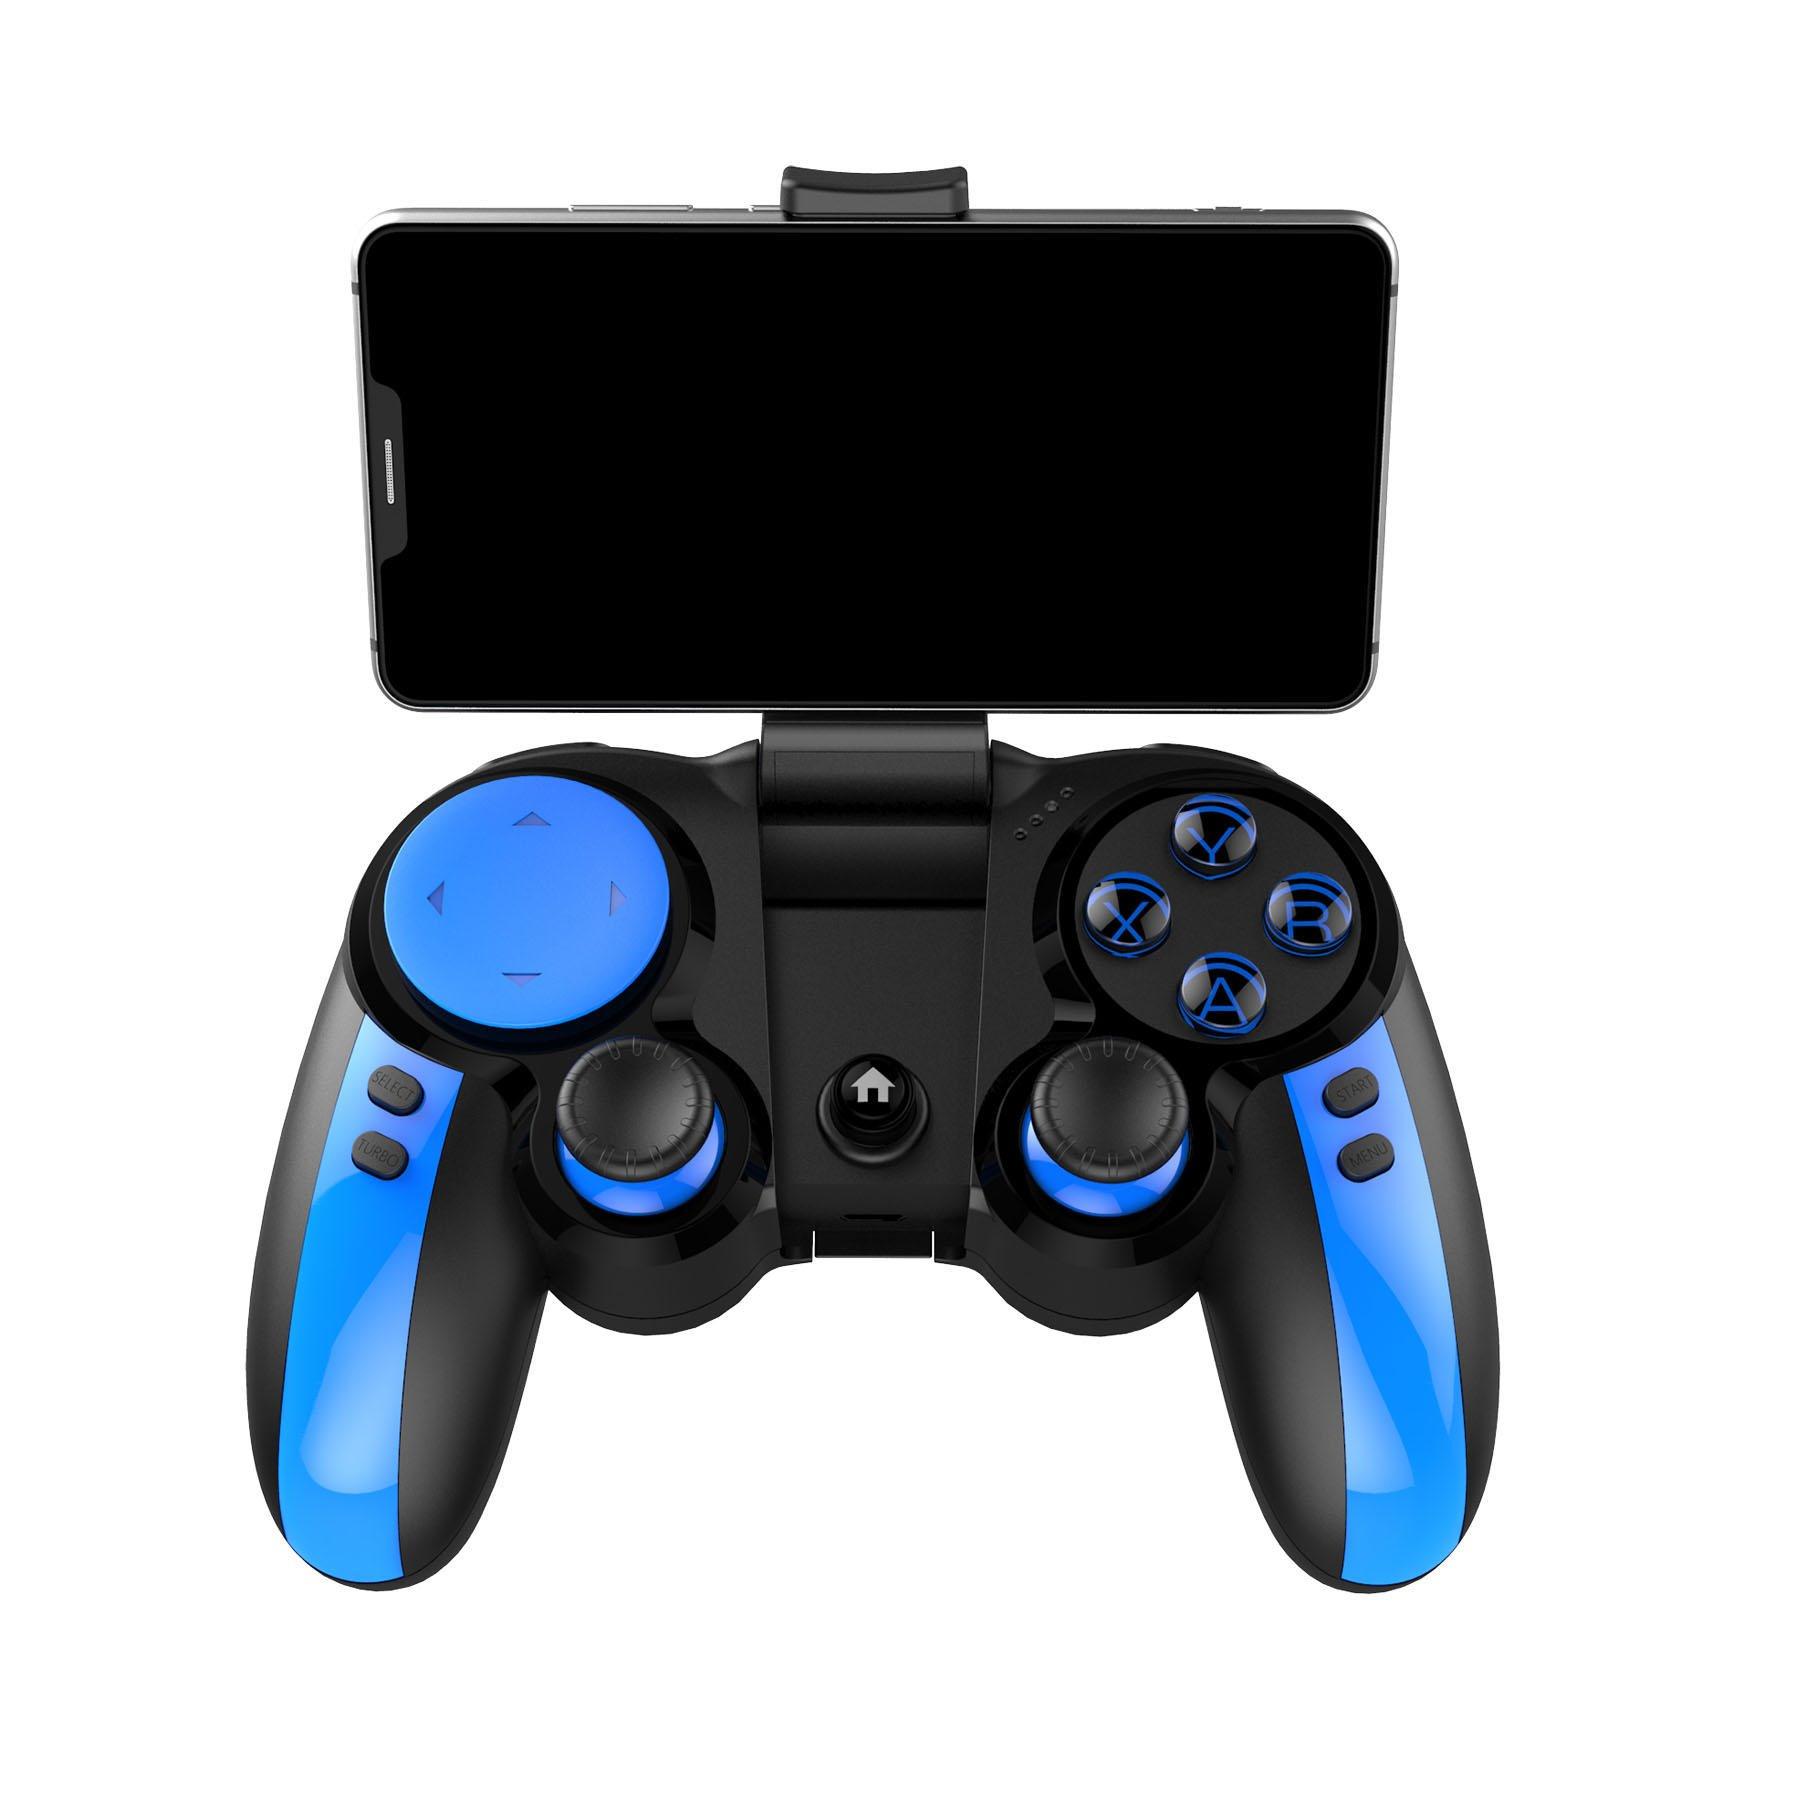 iPega 9090 2.4Ghz & Bluetooth Gamepad Fortnite/PUBG IOS/Android (EU Blister)